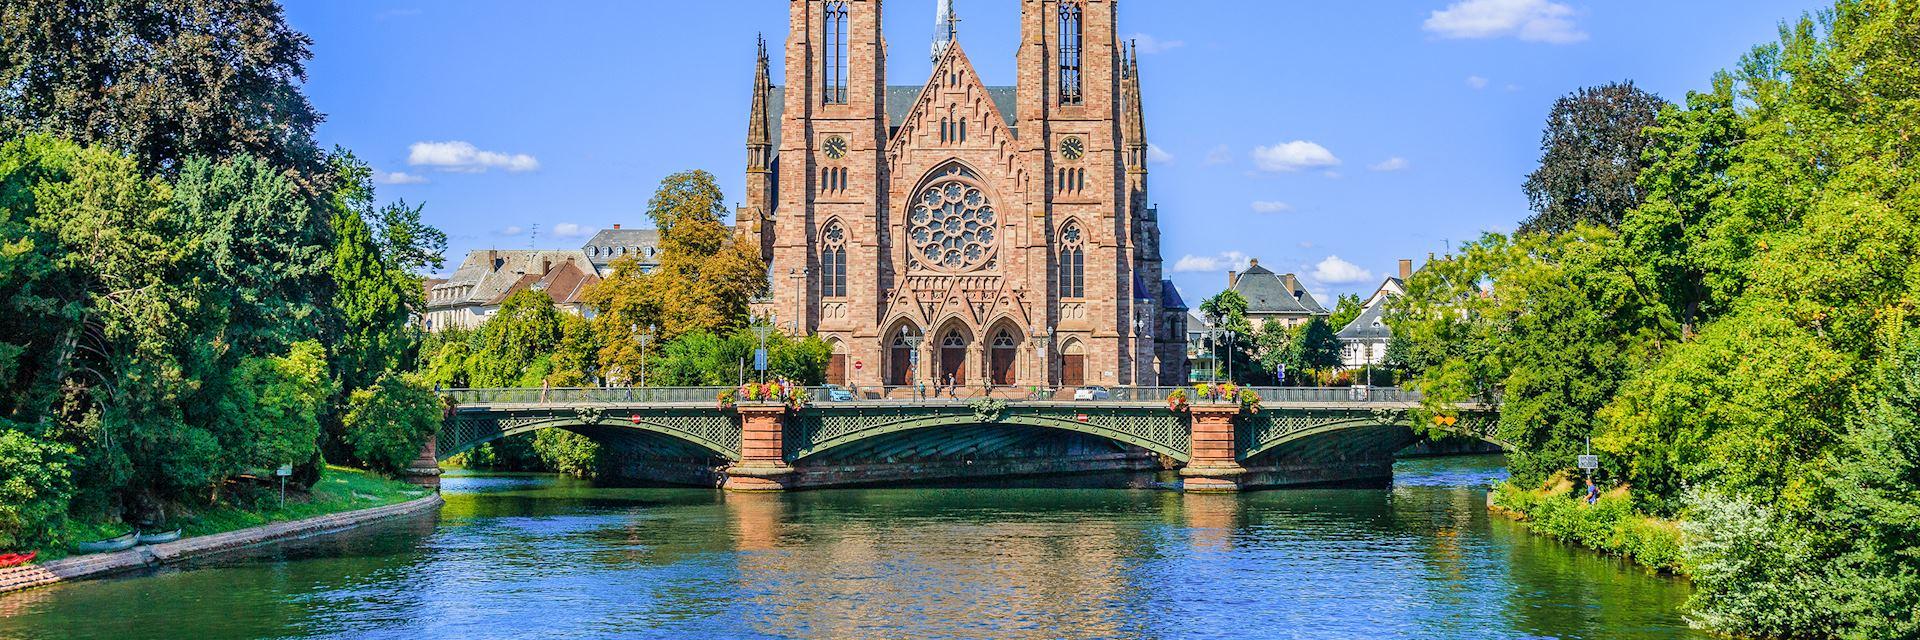 Strasbourg Cathedral, Alsace